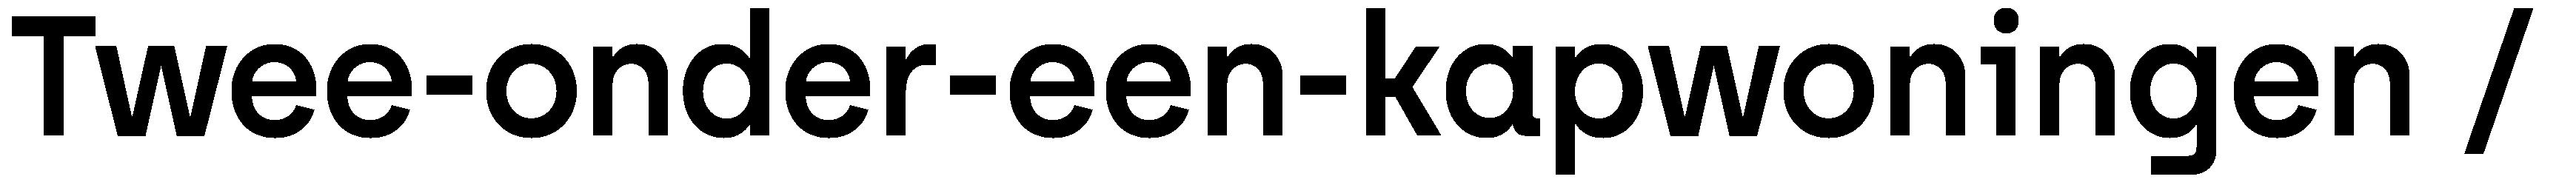 2a3d3d40-1acc-11eb-9a9b-d7b2c1c04ca0.png